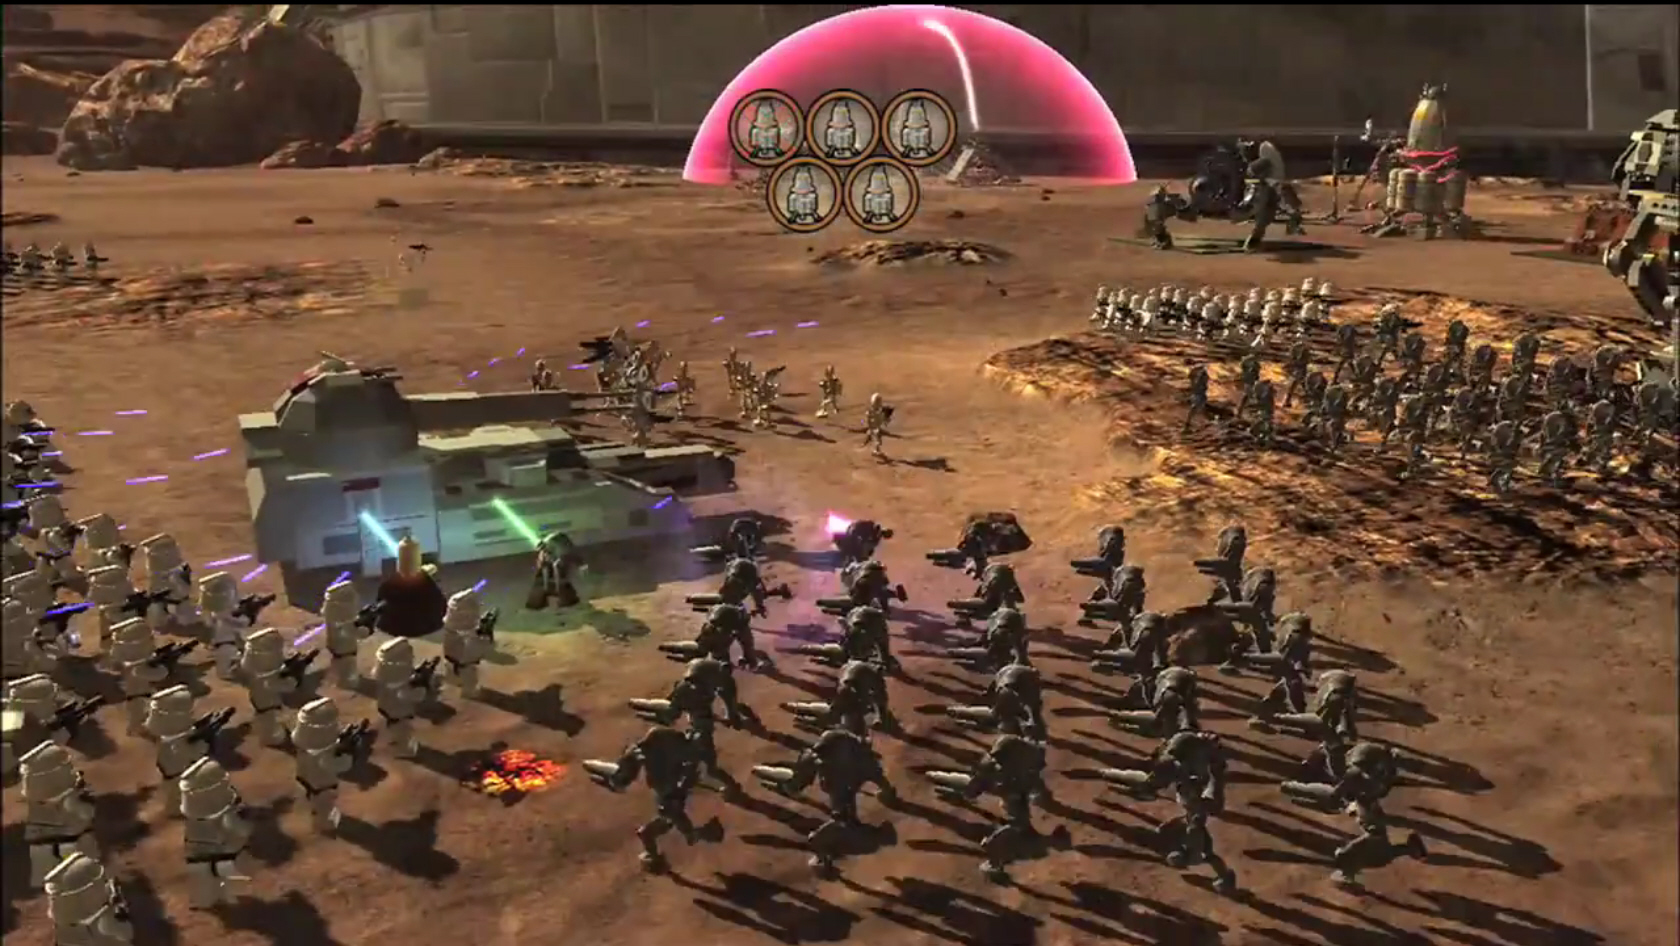 star wars the clone wars torrent download